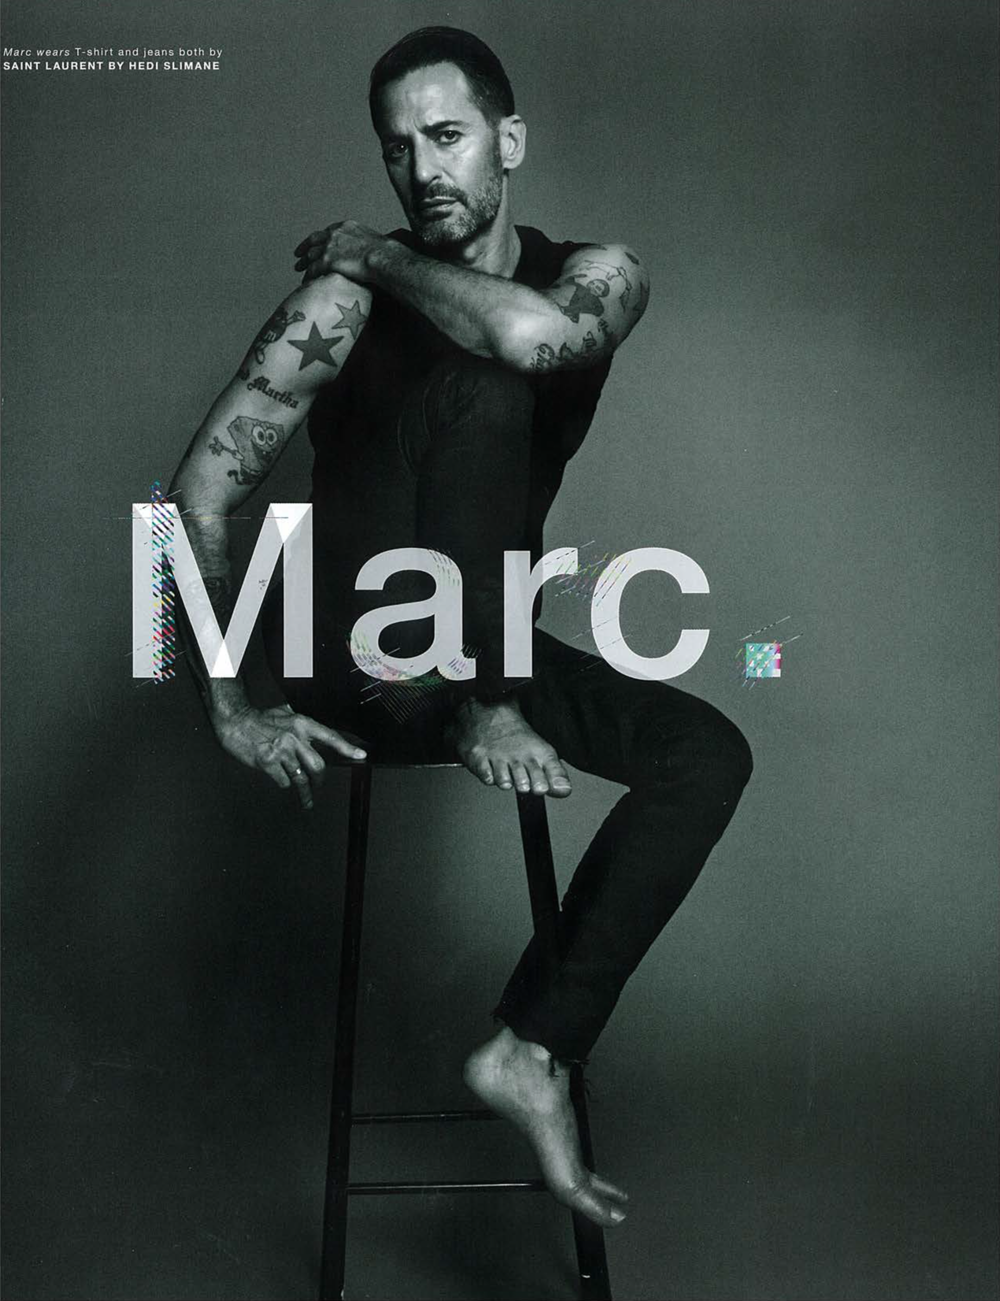 MARC - VIA LOVE MAGAZINE